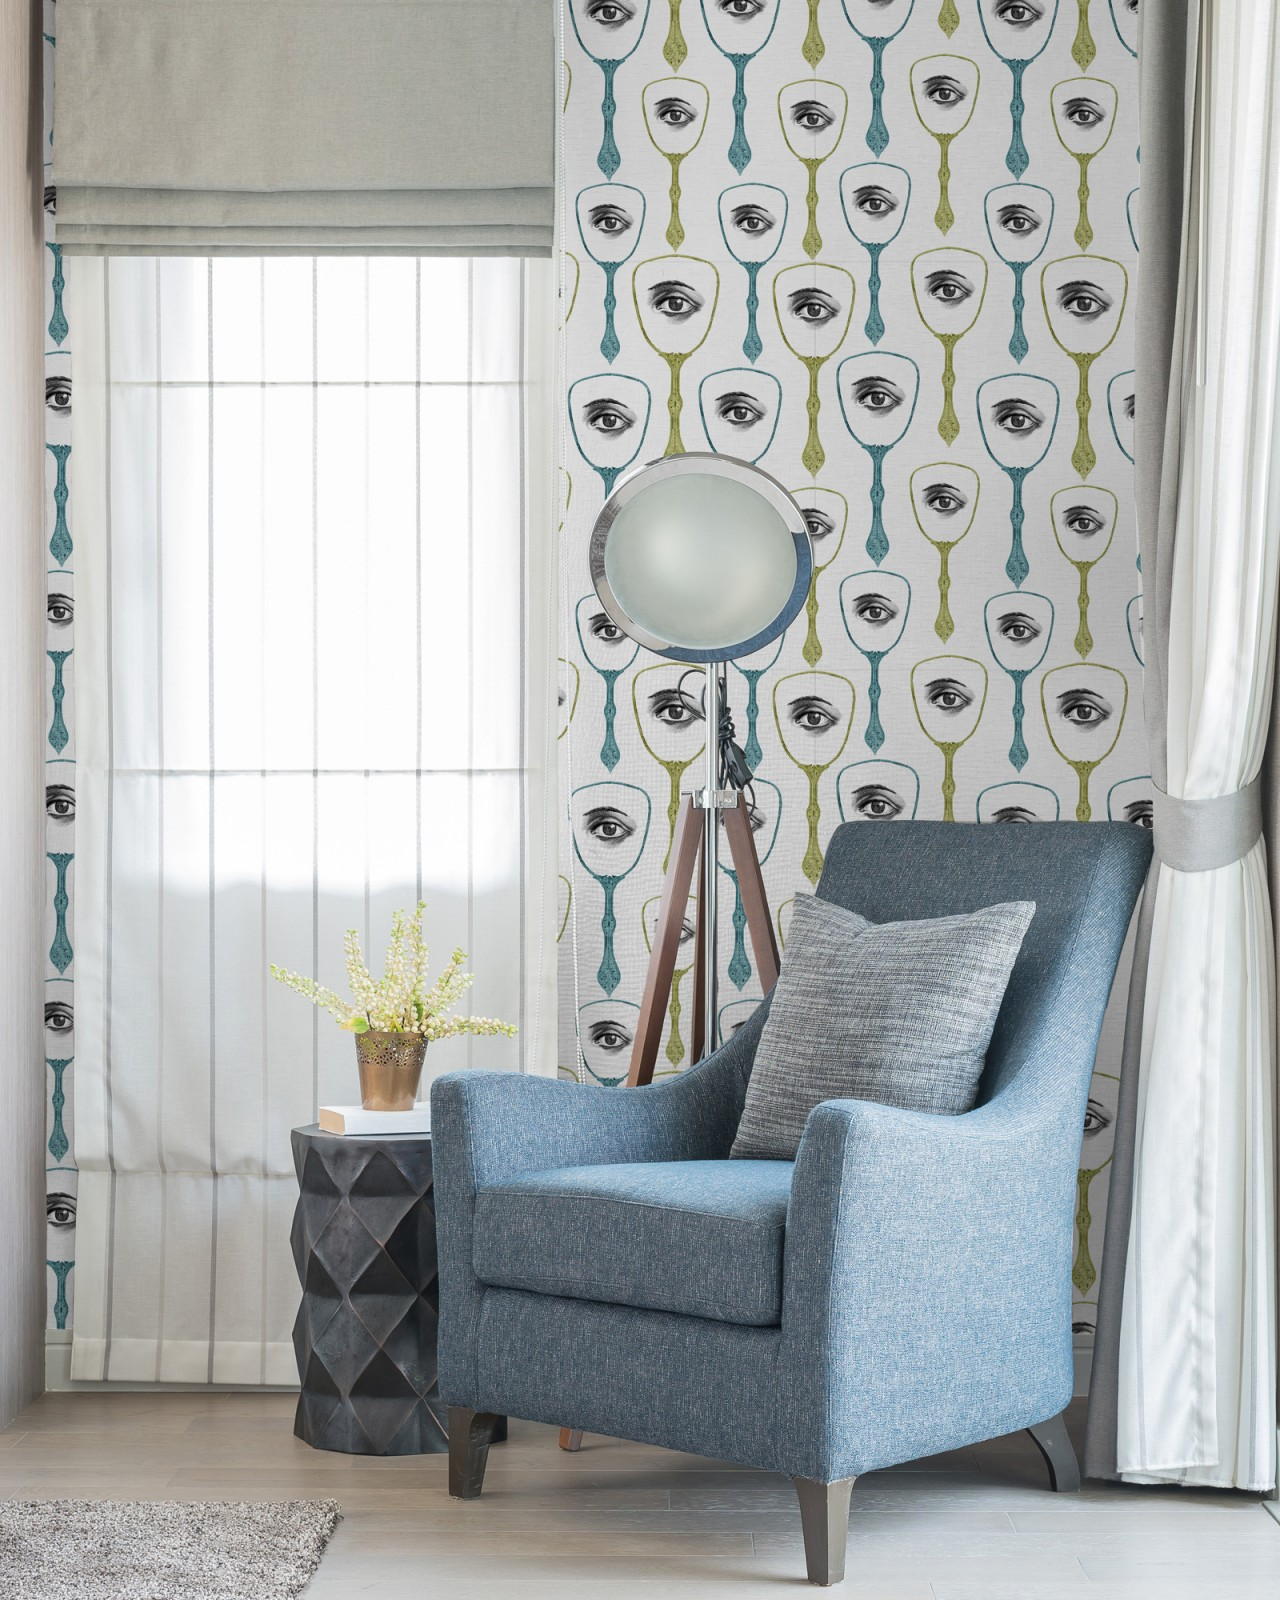 MIRROR'S EYE Premium Wallpaper